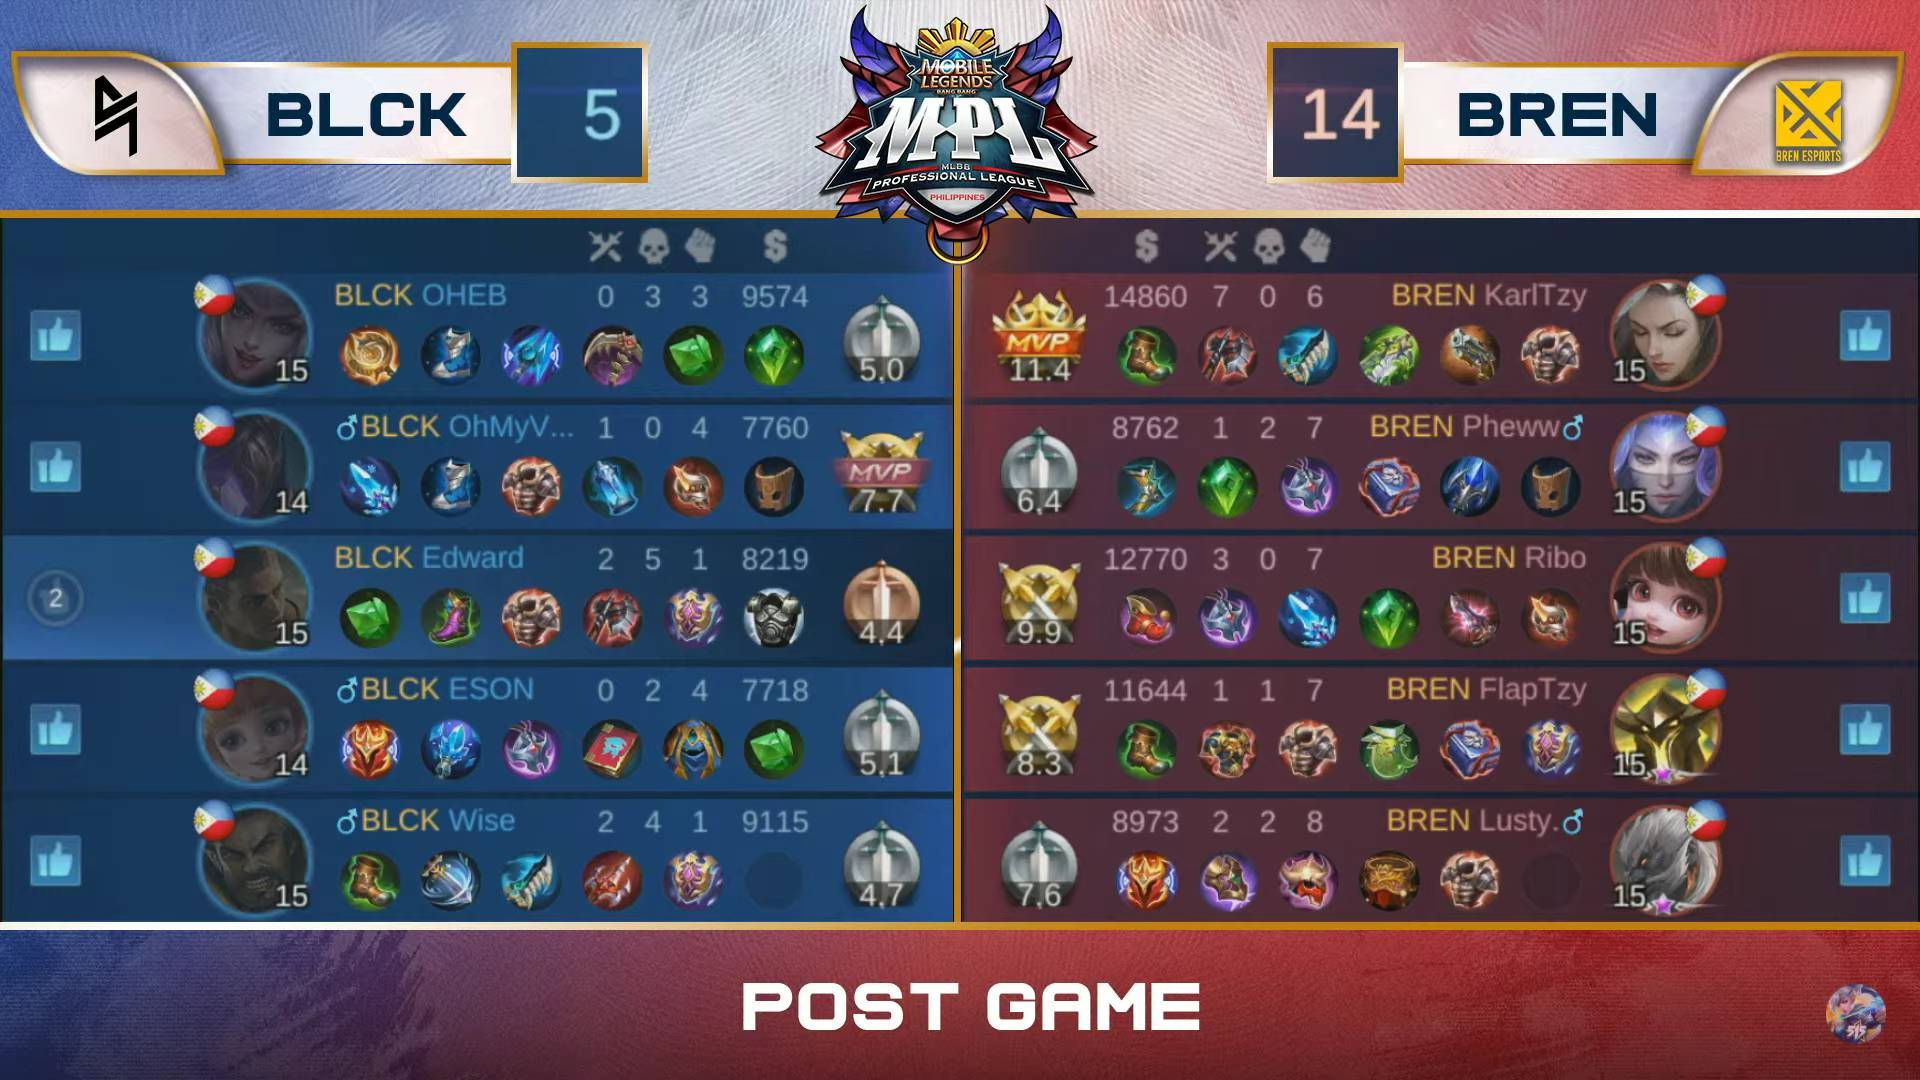 MPL-PH-Season-7-Bren-def-Blacklist-Game-3 Lusty clutch knock-up triggers Bren's statement comeback vs Blacklist in MPL PH ESports Mobile Legends MPL-PH News  - philippine sports news